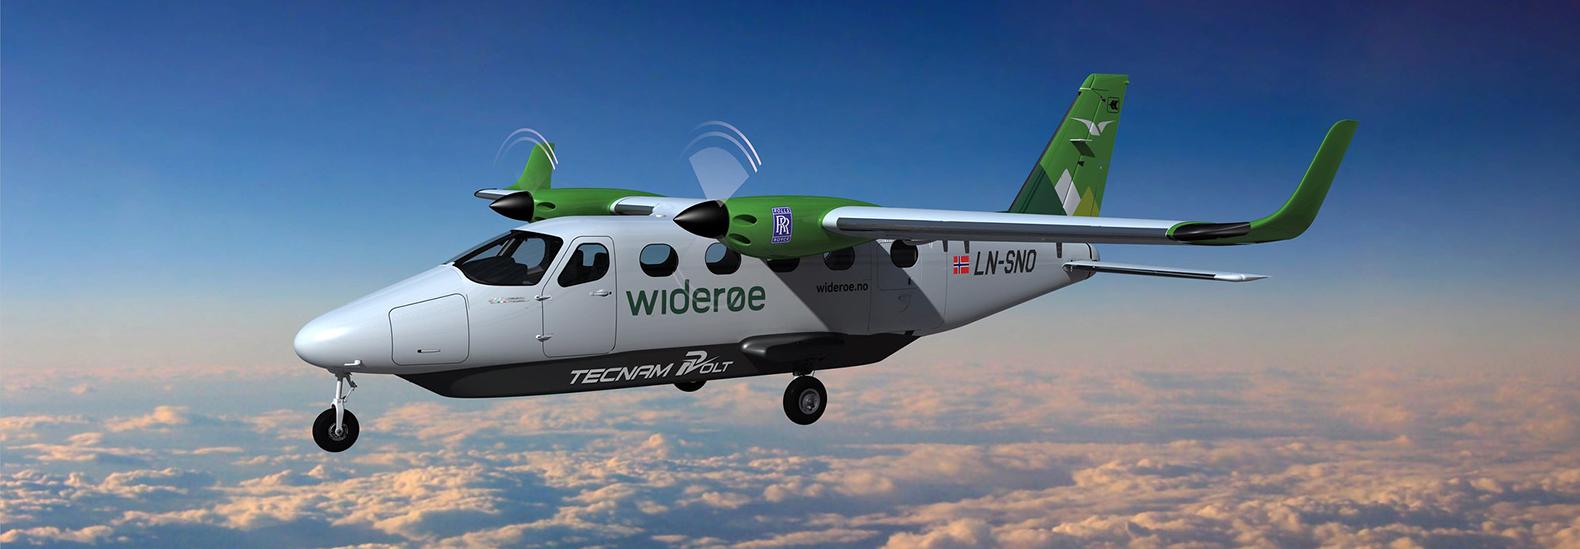 Rolls-Royce, Tecnam and Widerøe develop electric passenger airplane